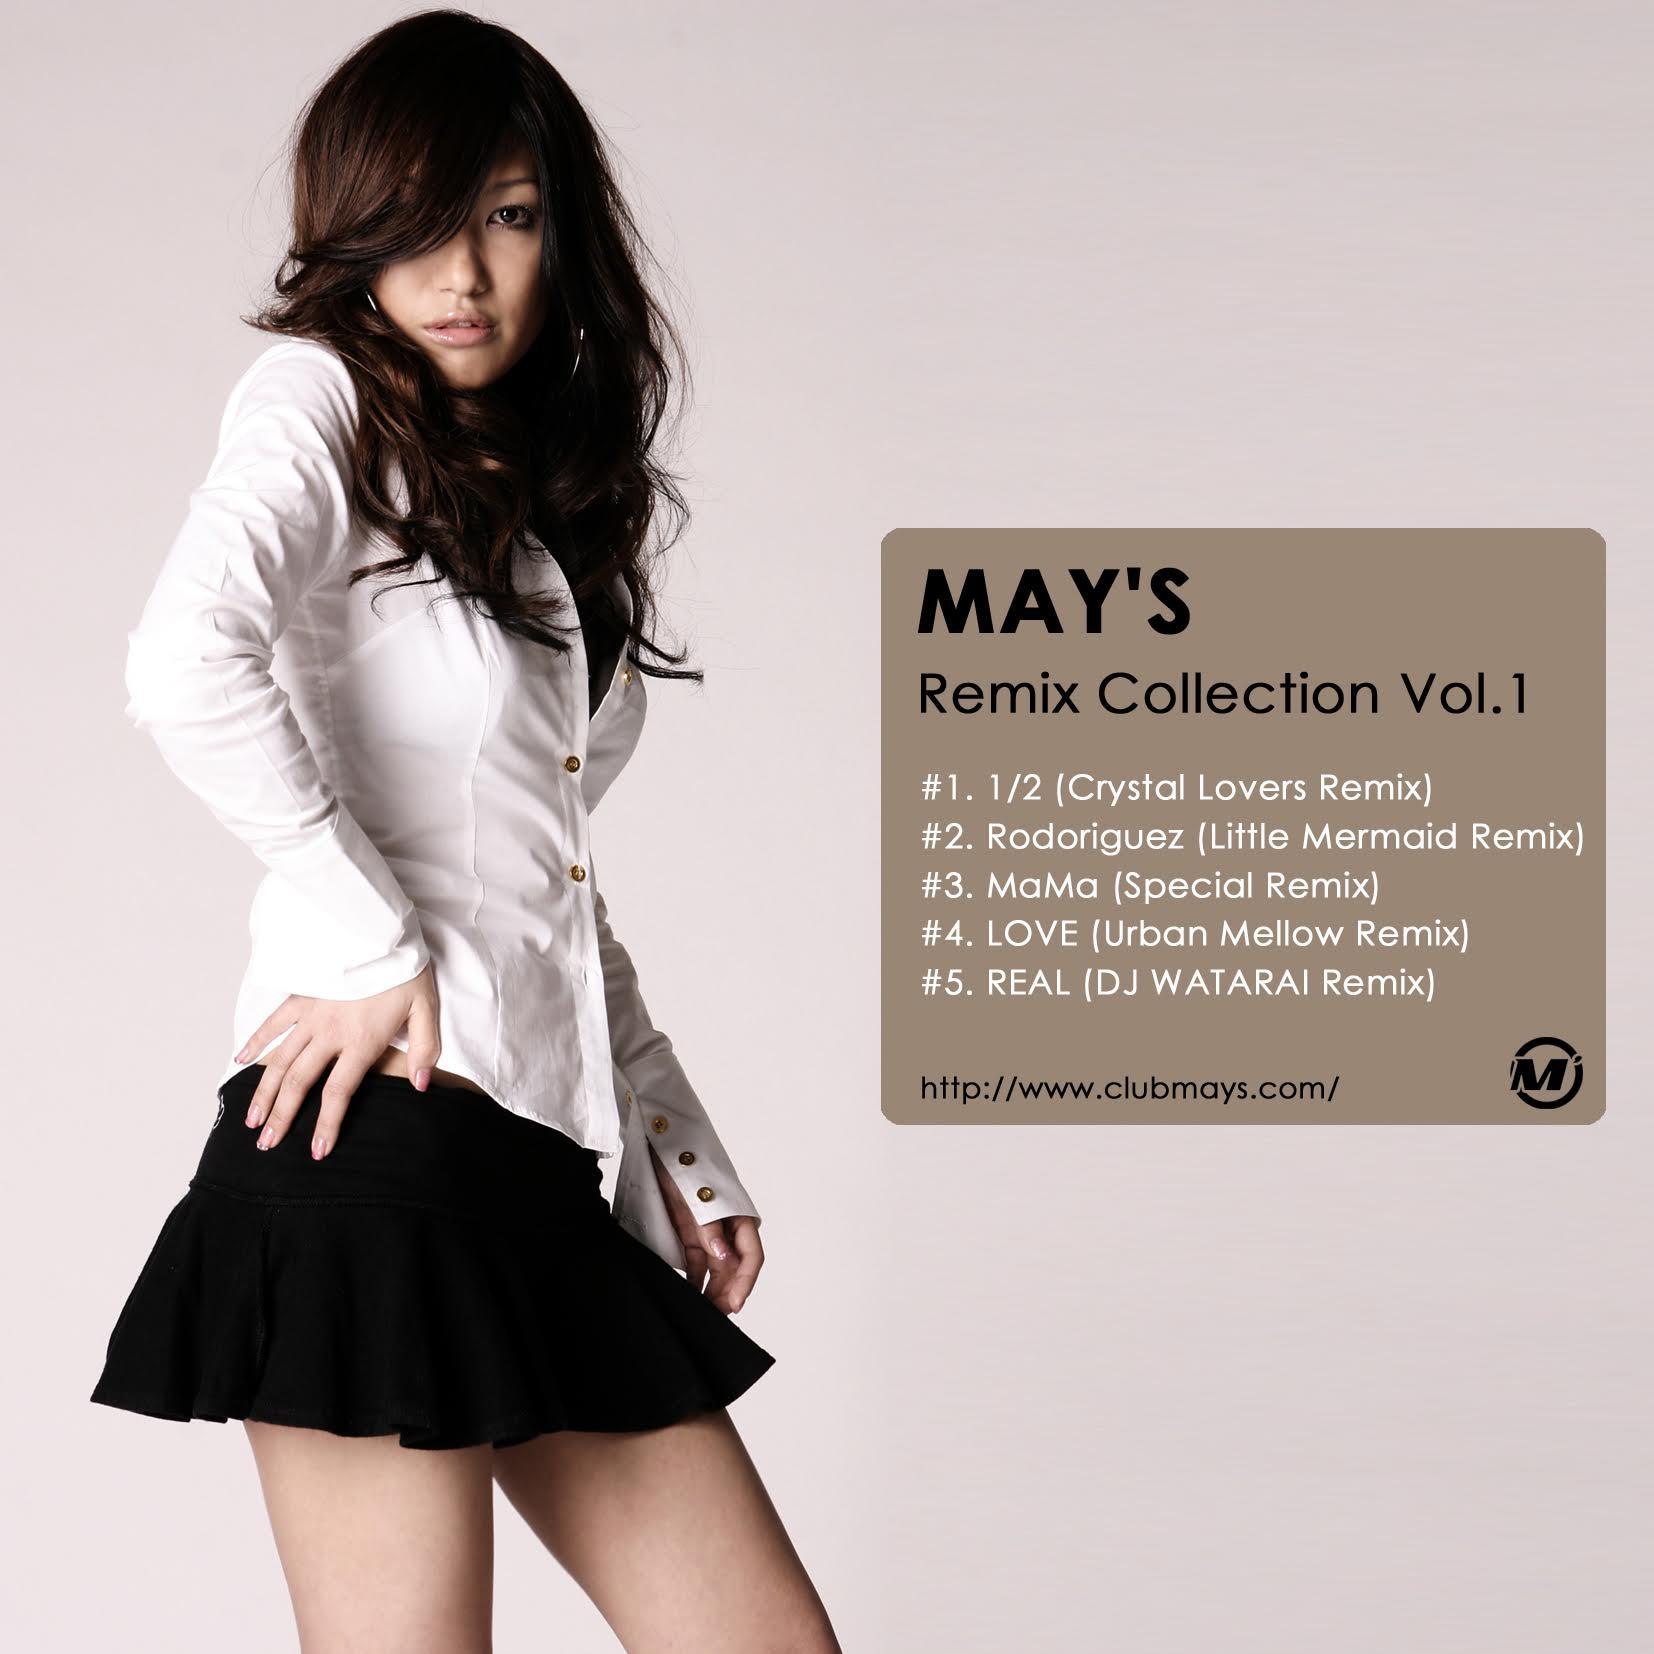 Remix Collection Vol.1